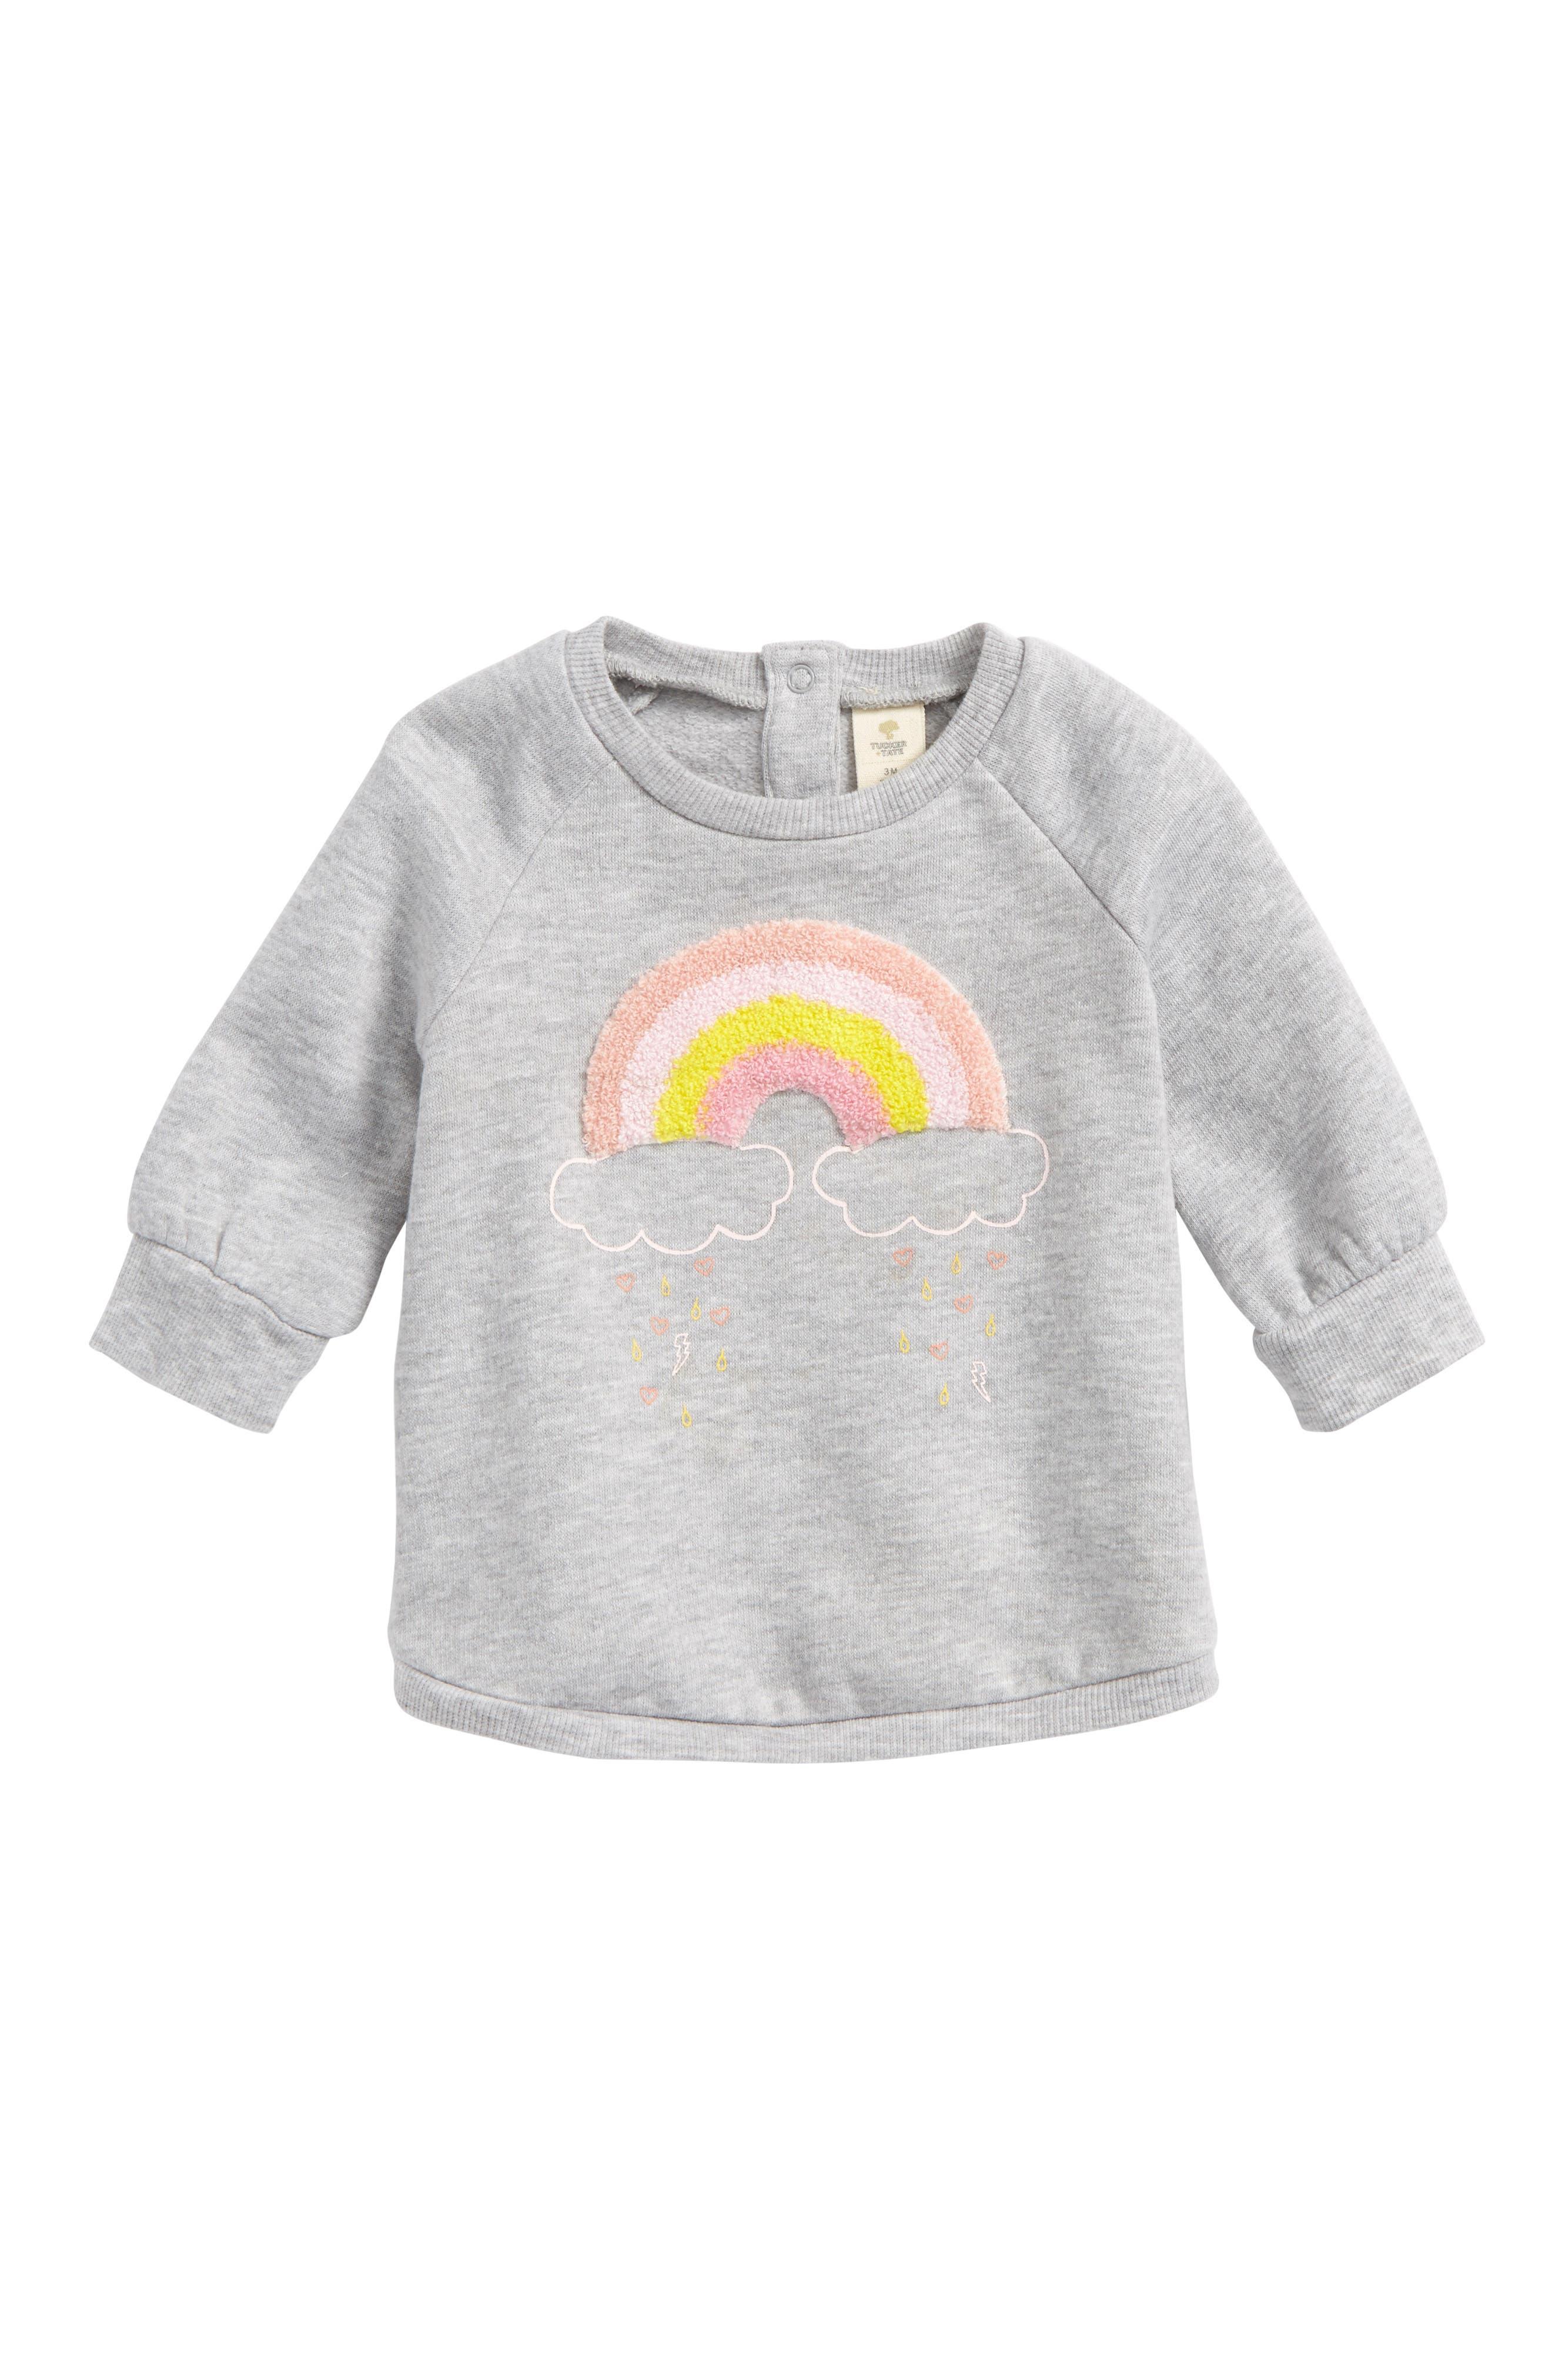 Tucker + Tate Rainbow Appliqué Tunic Top (Baby Girls)